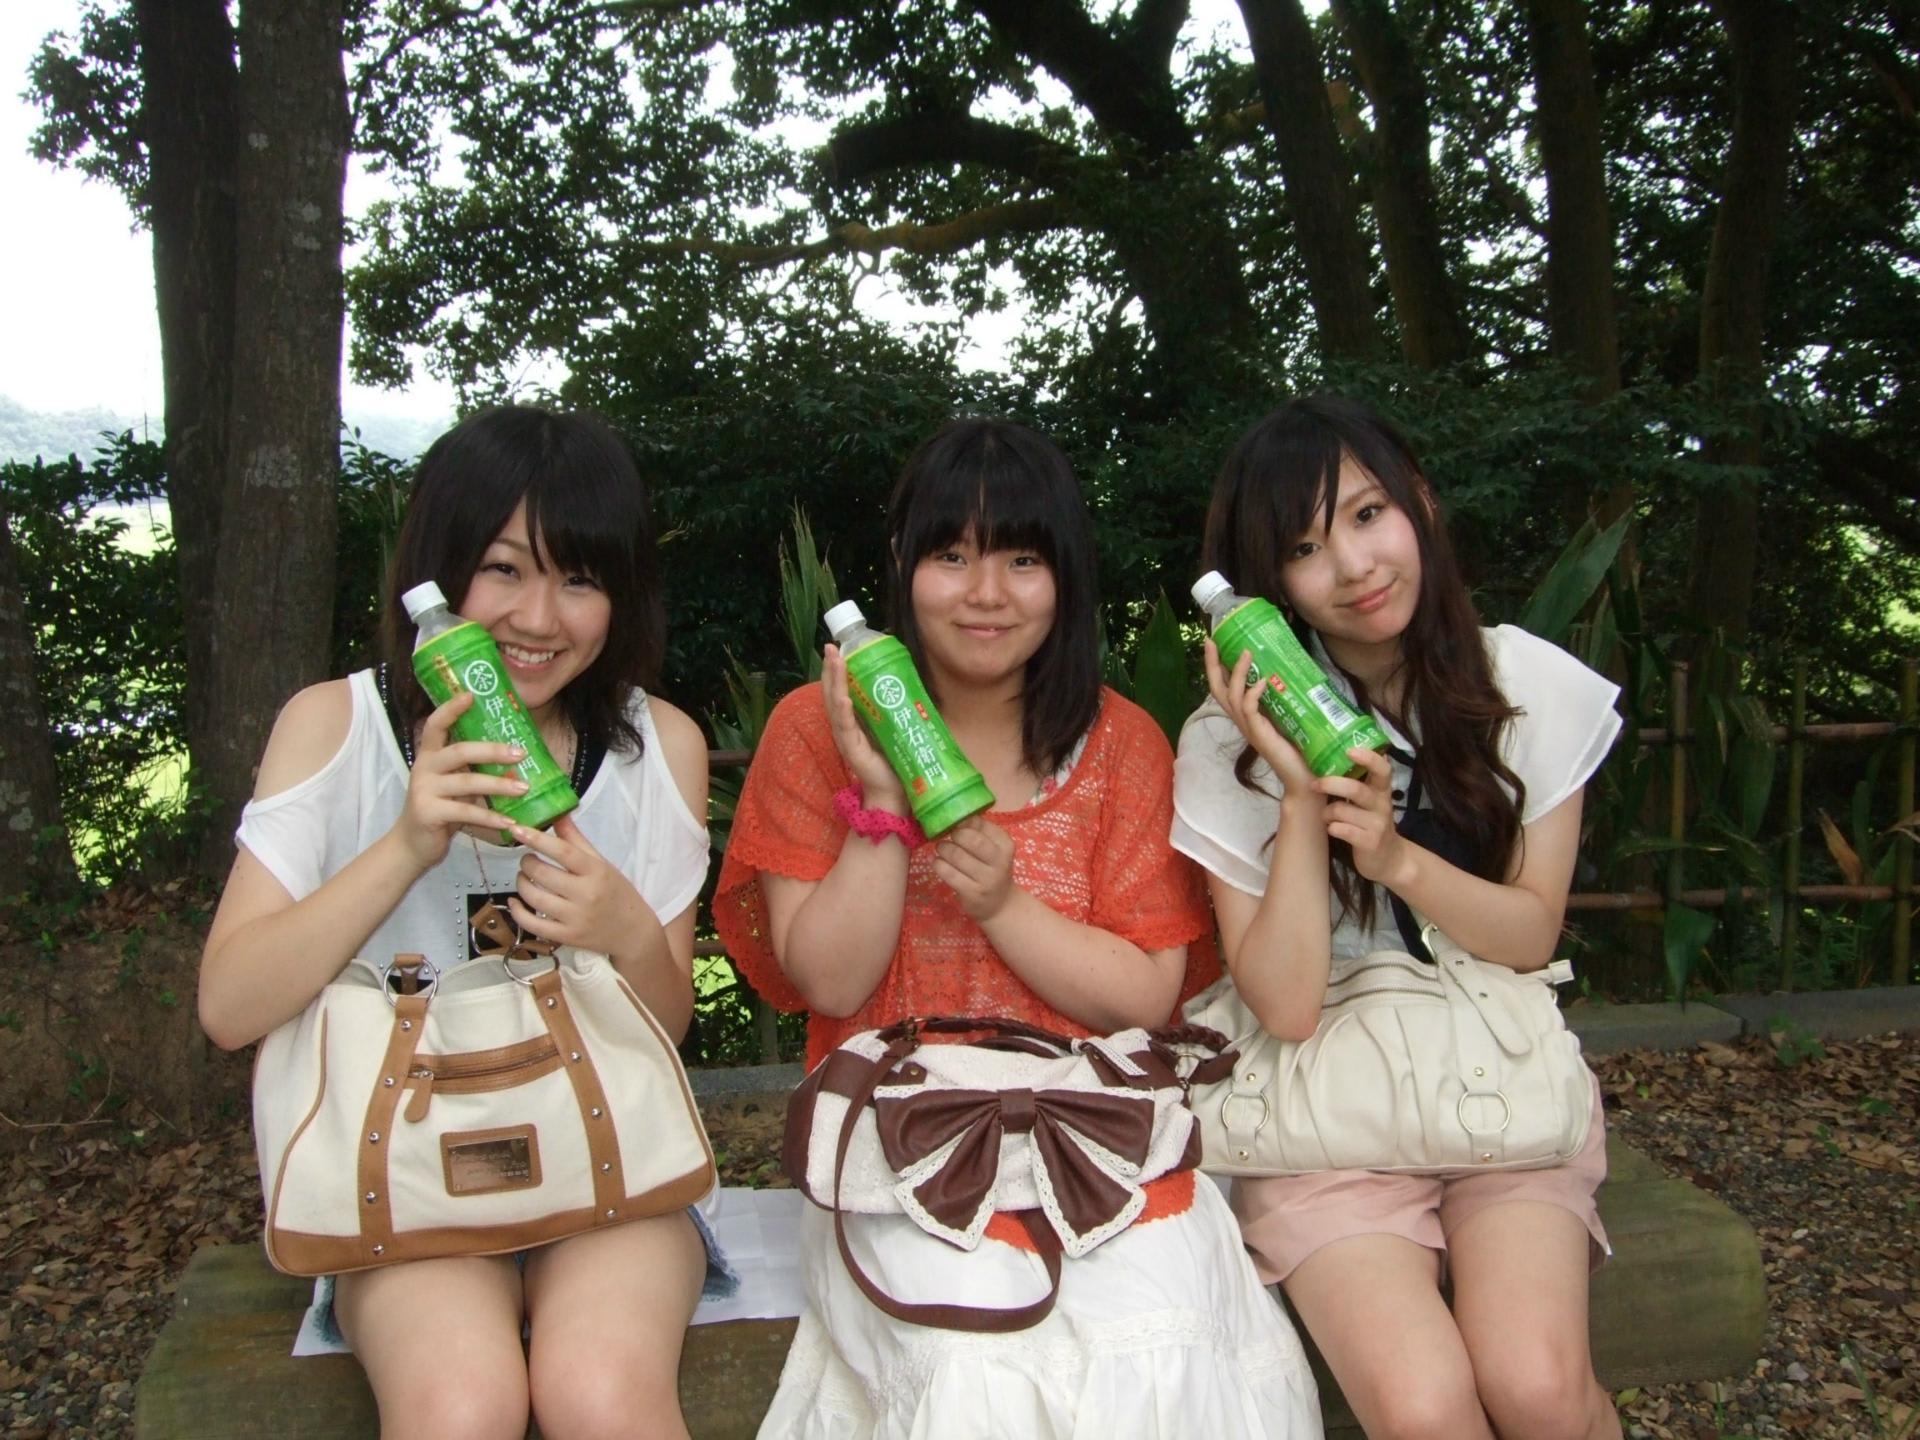 PPV 【期間限定】☆超S級美人妻☆生ハメ・生 FC2 911435